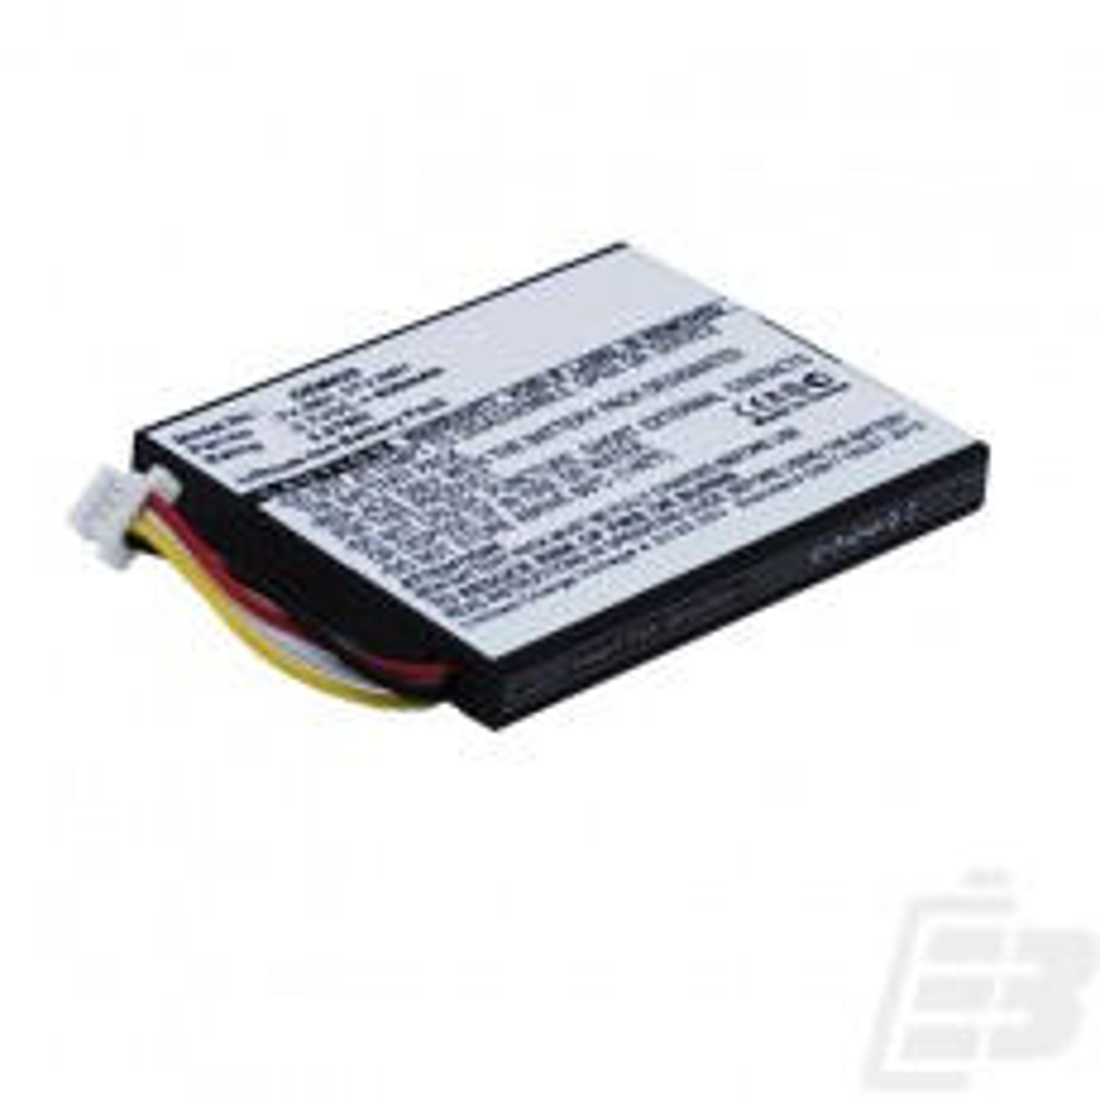 Raid controler battery Dell PowerEdge R820_1